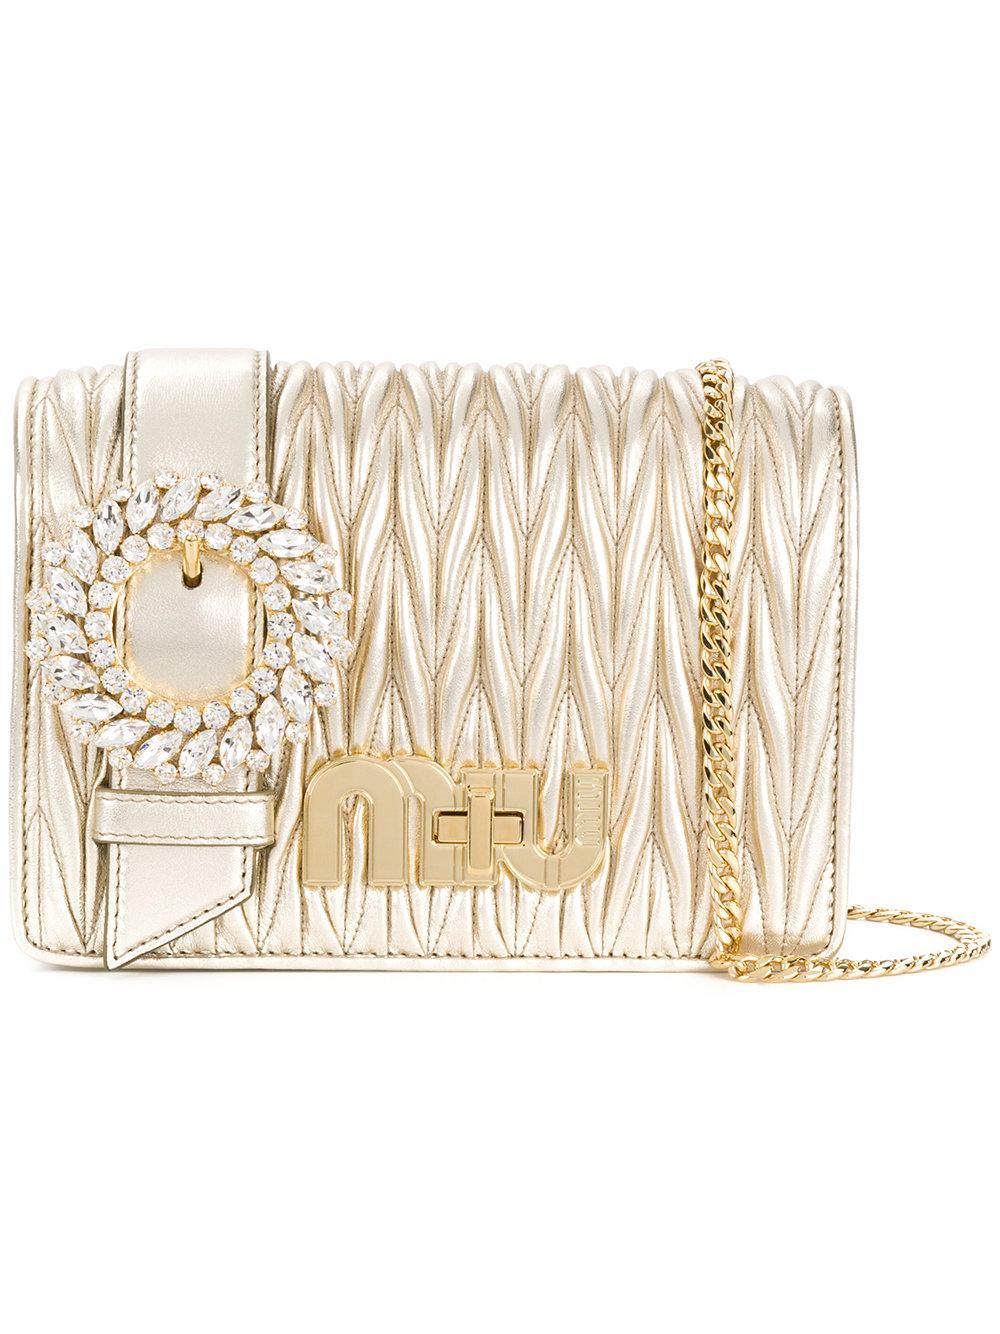 Miu Miu My Miu Shoulder Bag In Metallic